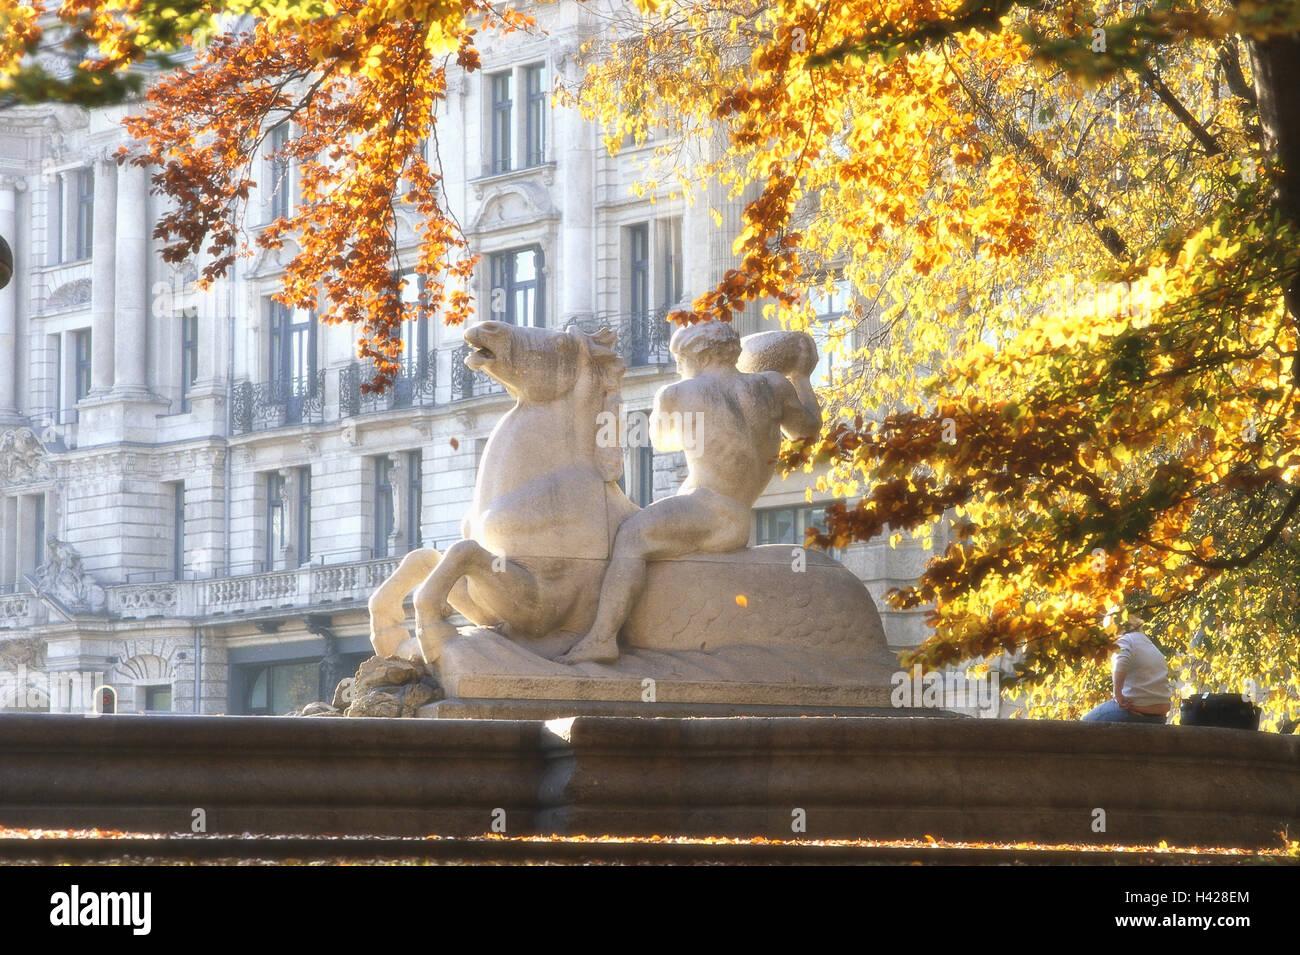 Germany, Upper Bavaria, Munich,  Wittelsbacher wells, detail, Well figure, autumn,  Bavaria, Lenbachplatz, Maximilian - Stock Image